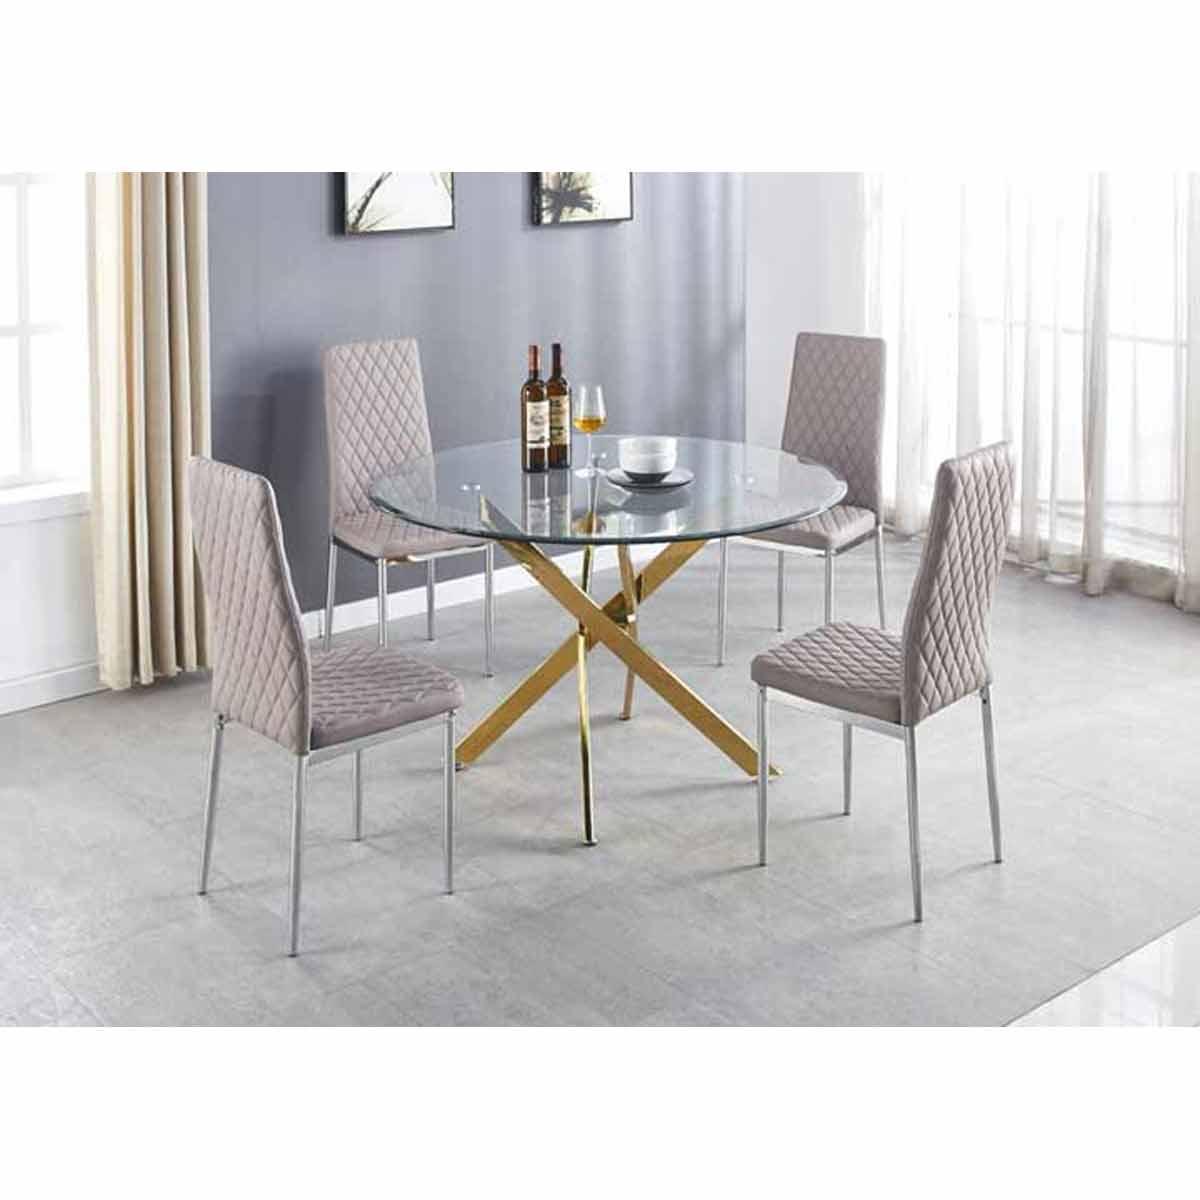 Furniture Box Novara Gold Metal Large Round Dining Table And 4 Cappuccino Grey Milan Chairs Set